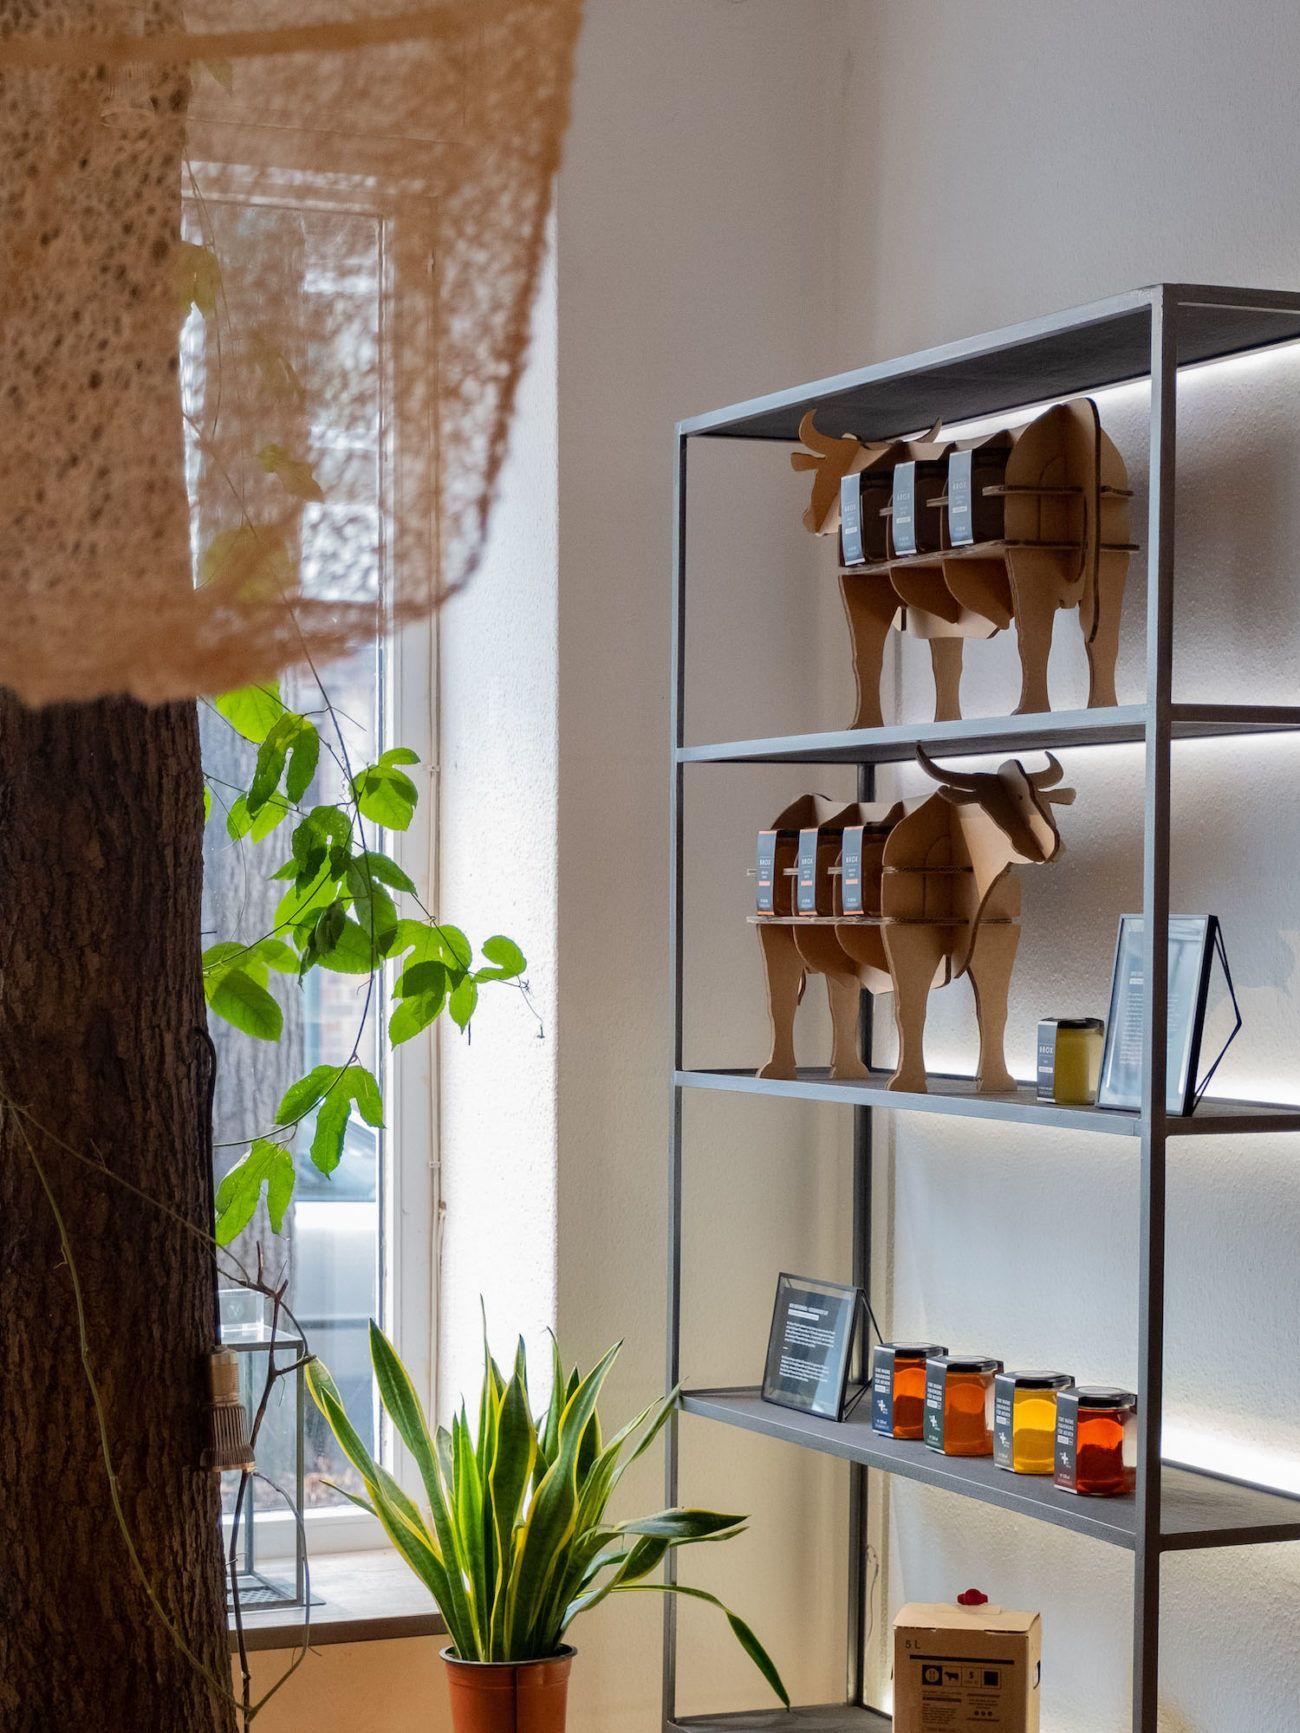 Brox Knochenbrühe, Abou Fuel, Brühe, Showroom, Pflanzen, Berlin